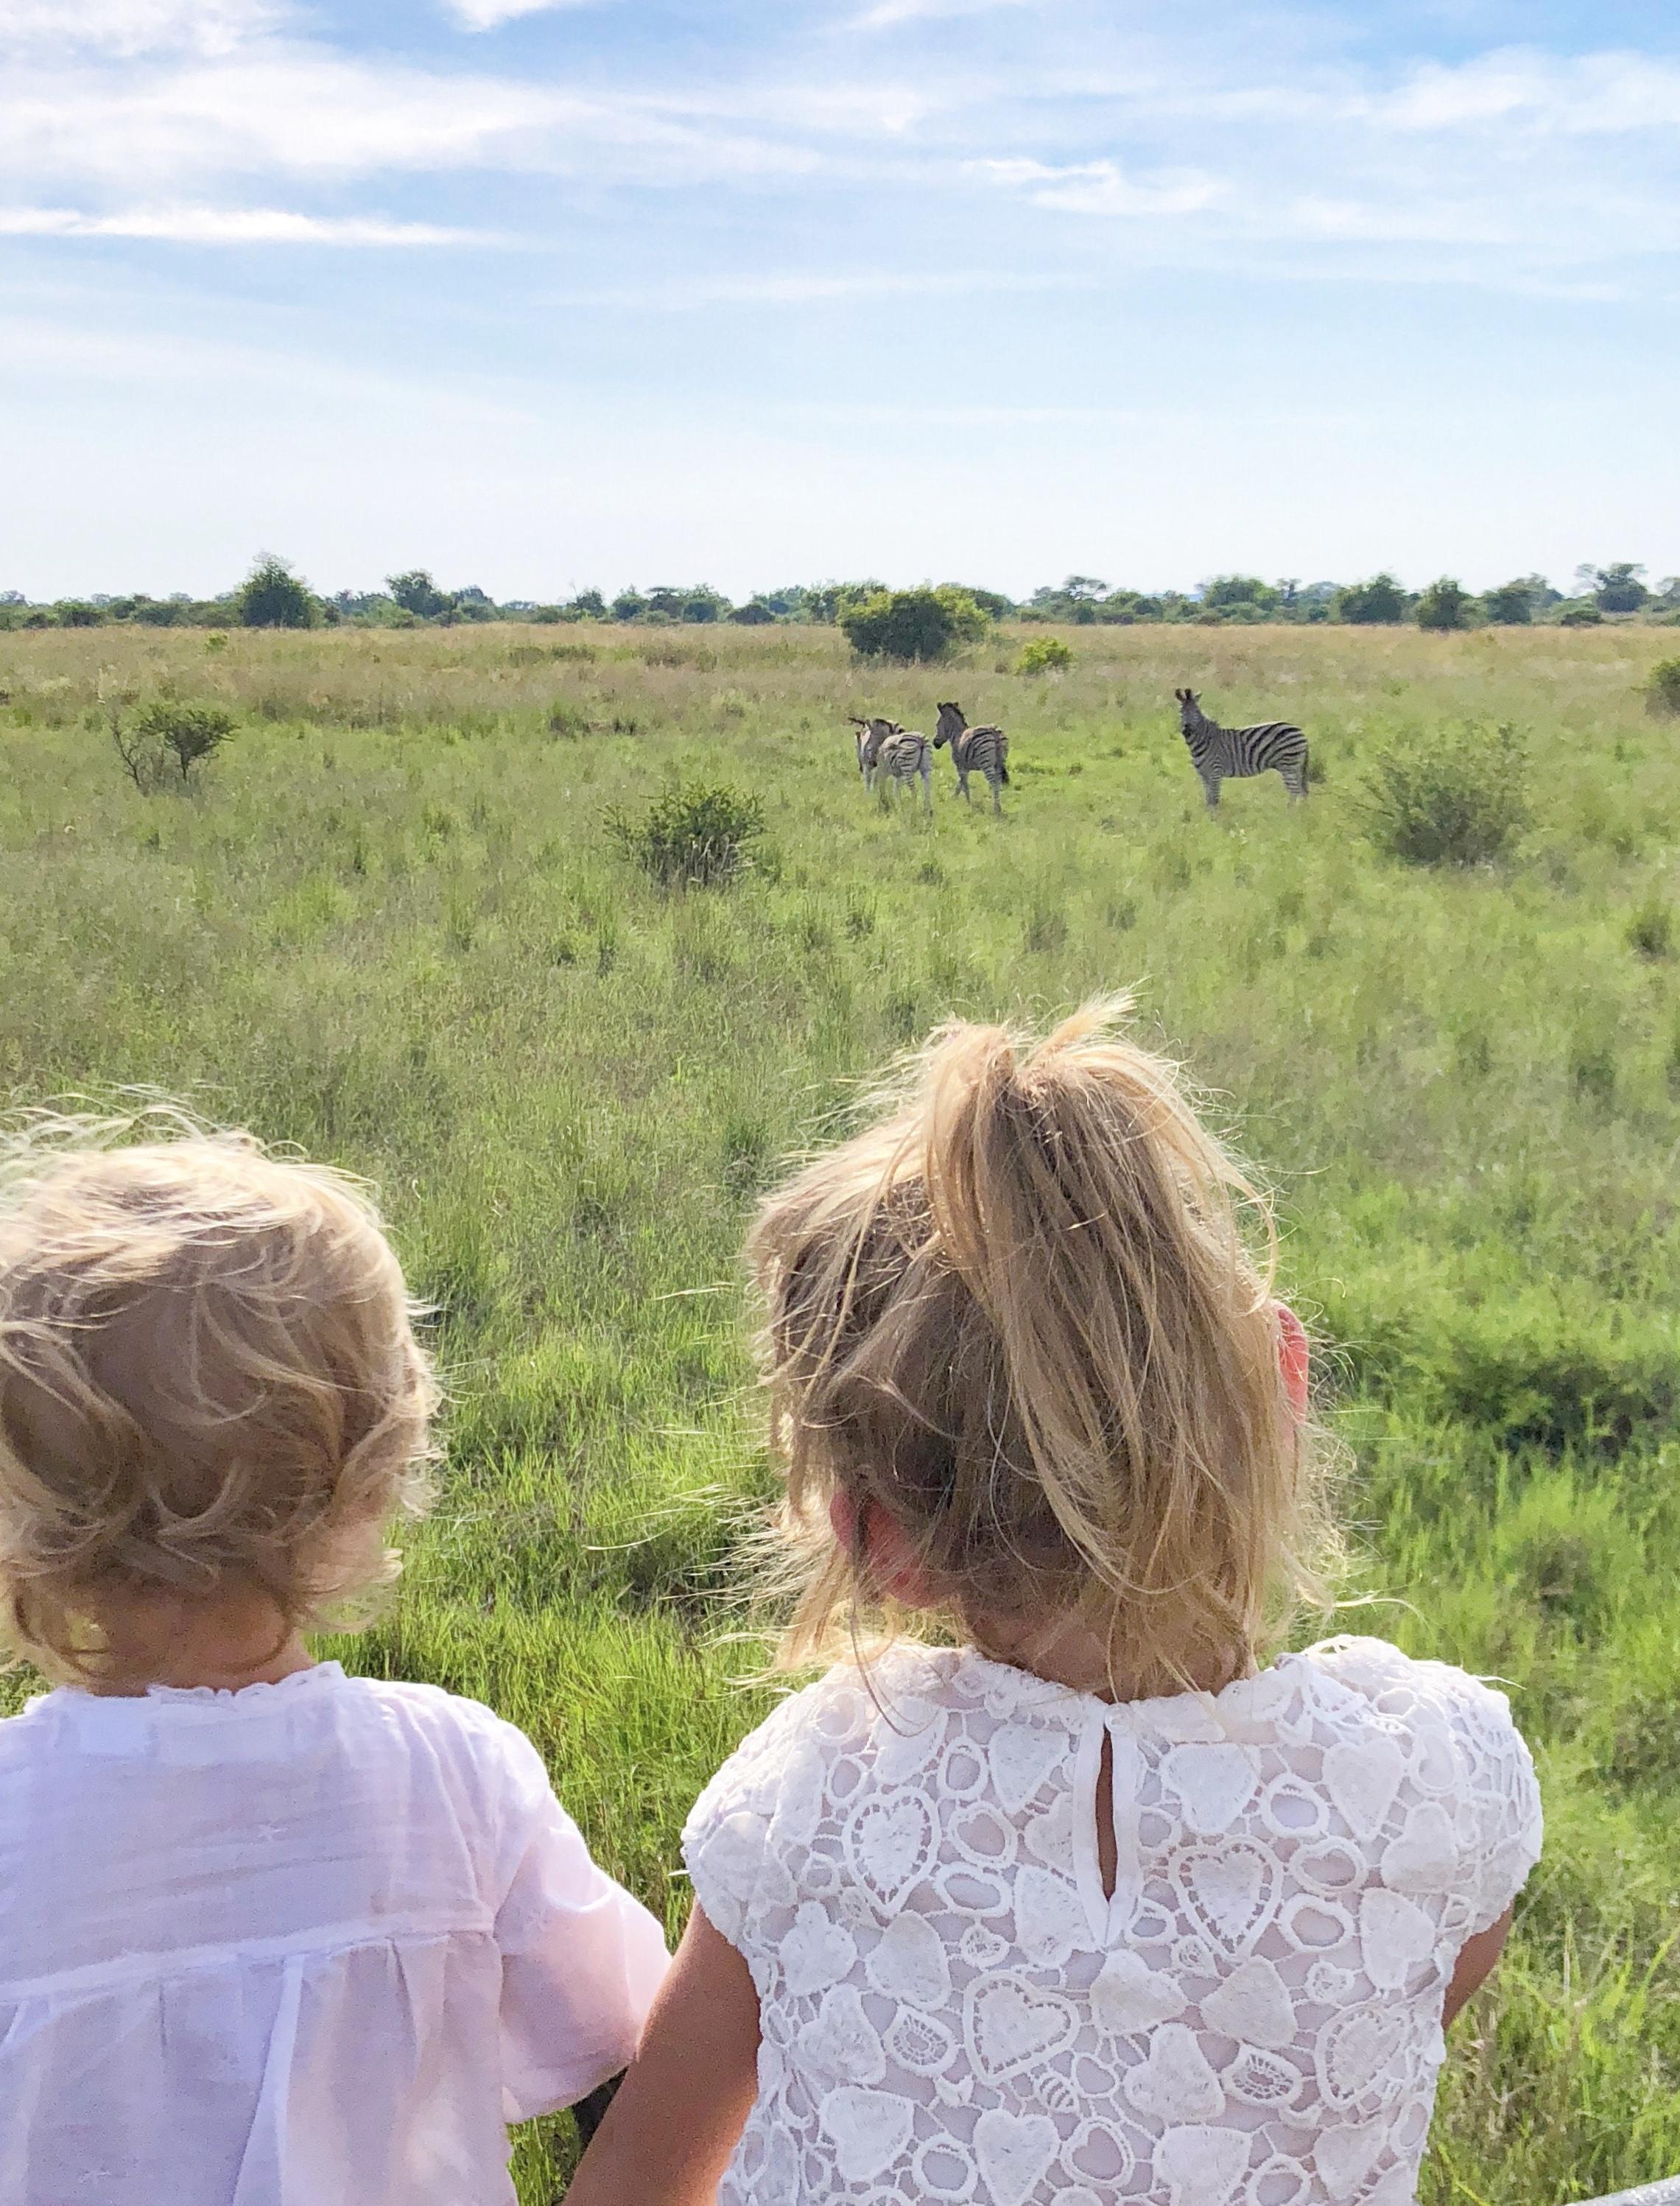 safari com crianças safari africa do sul safari quenia